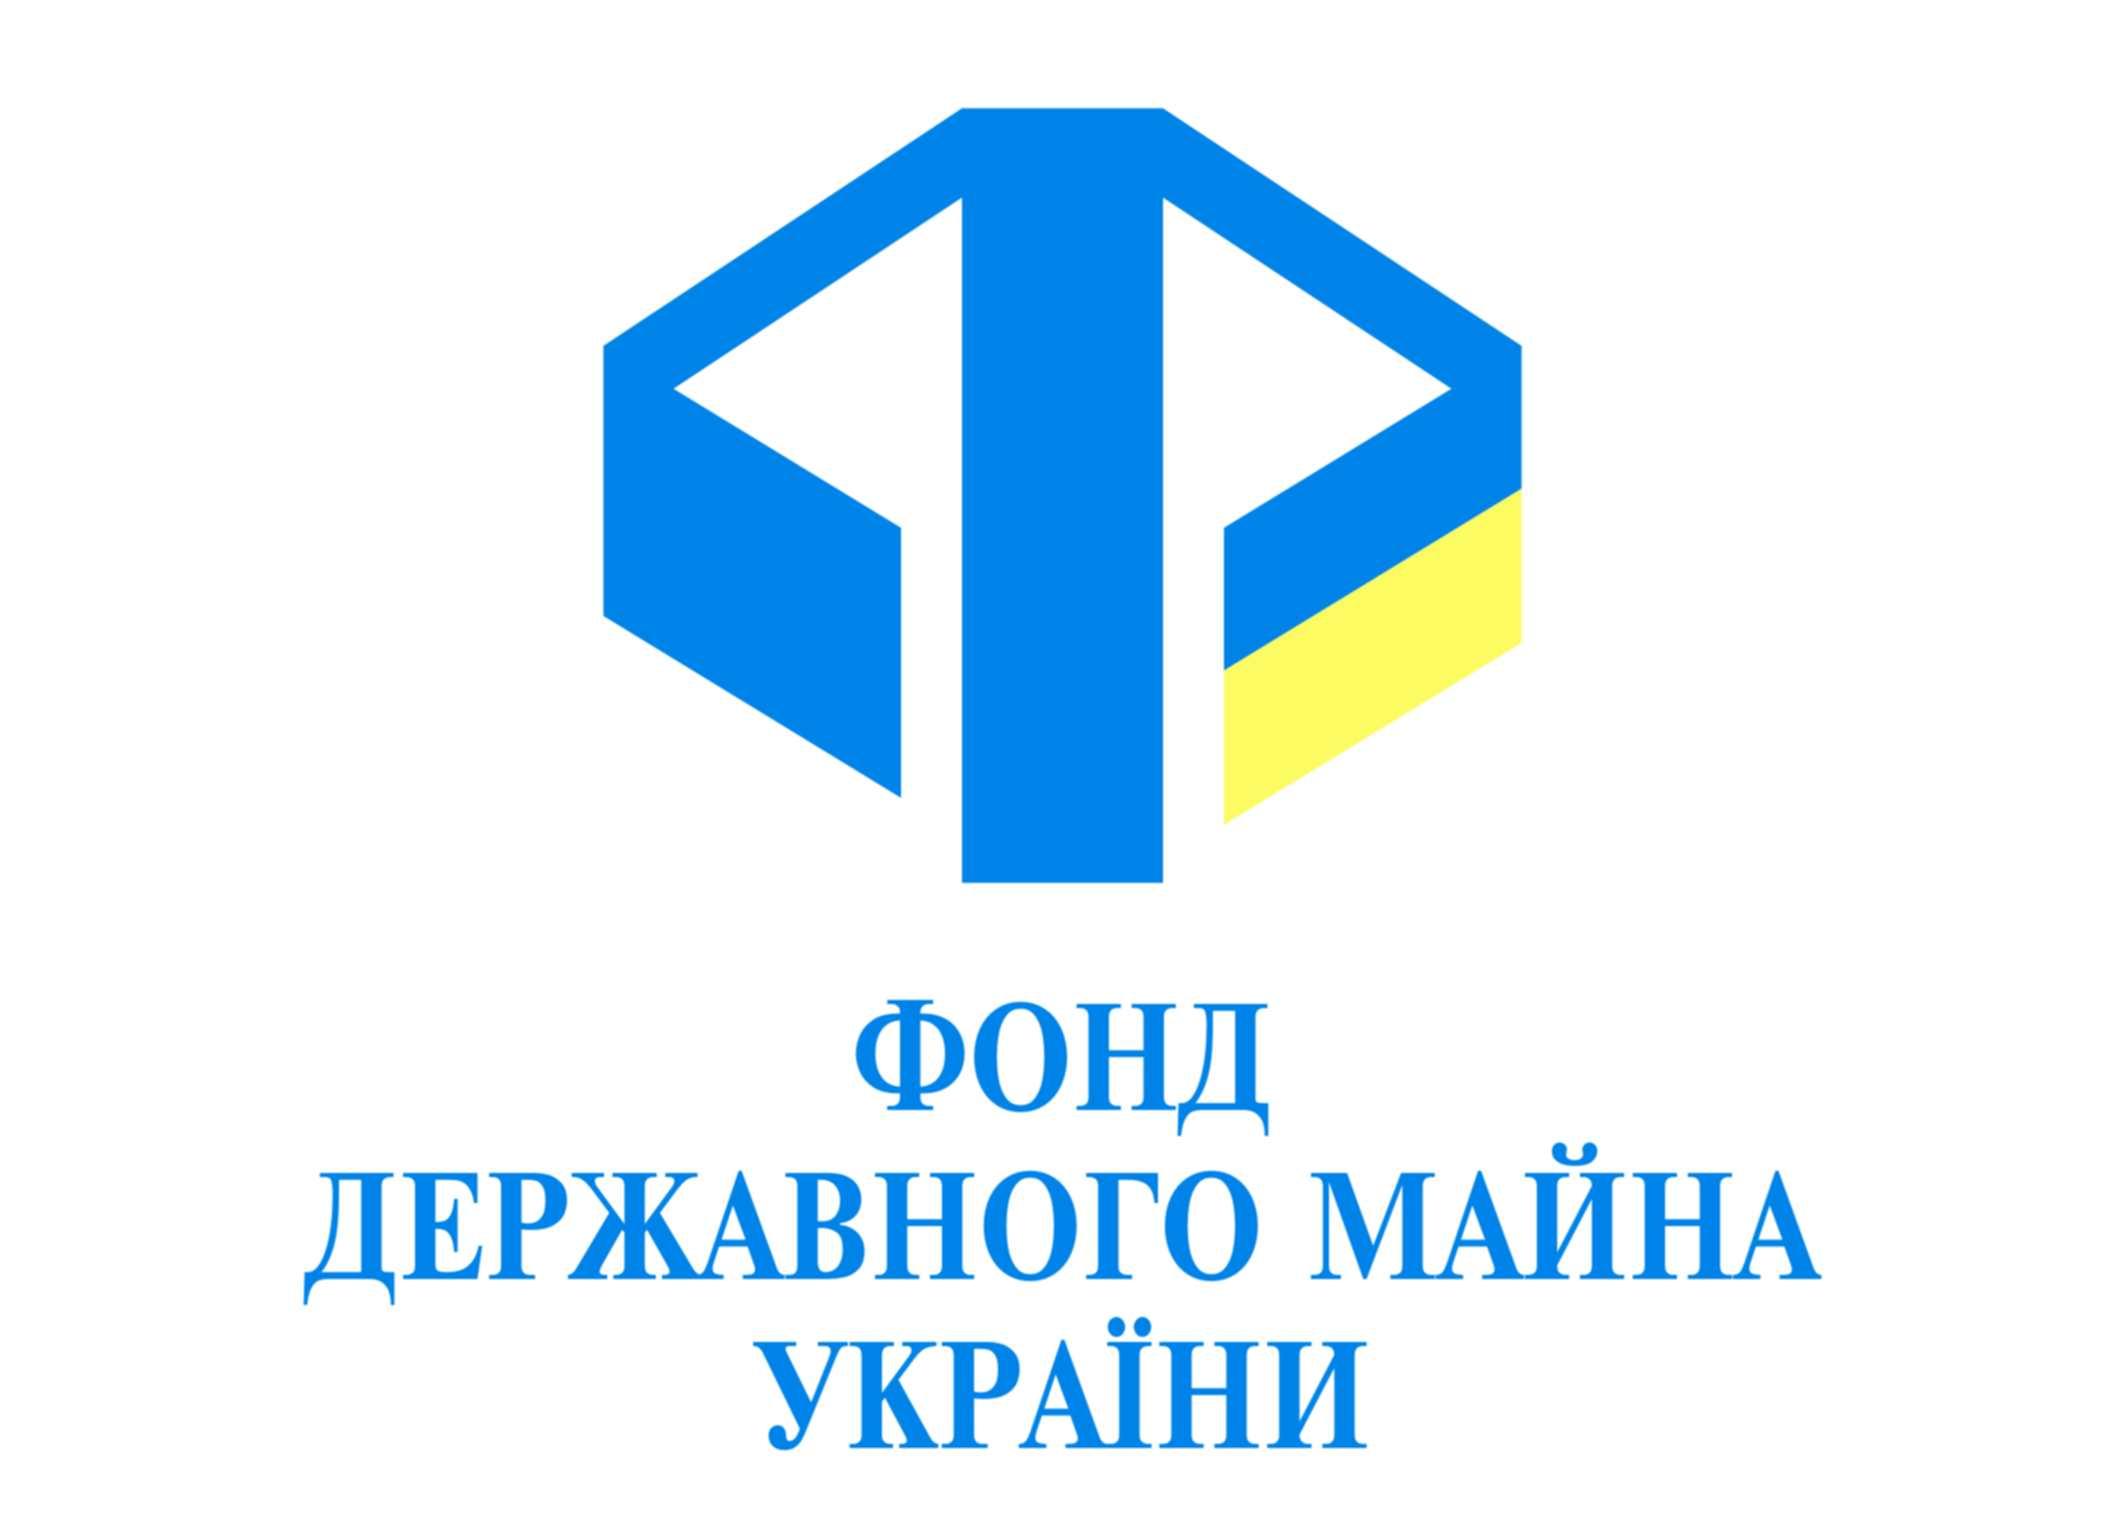 Фірмовий_блок_Фонду_Державного_майна_України